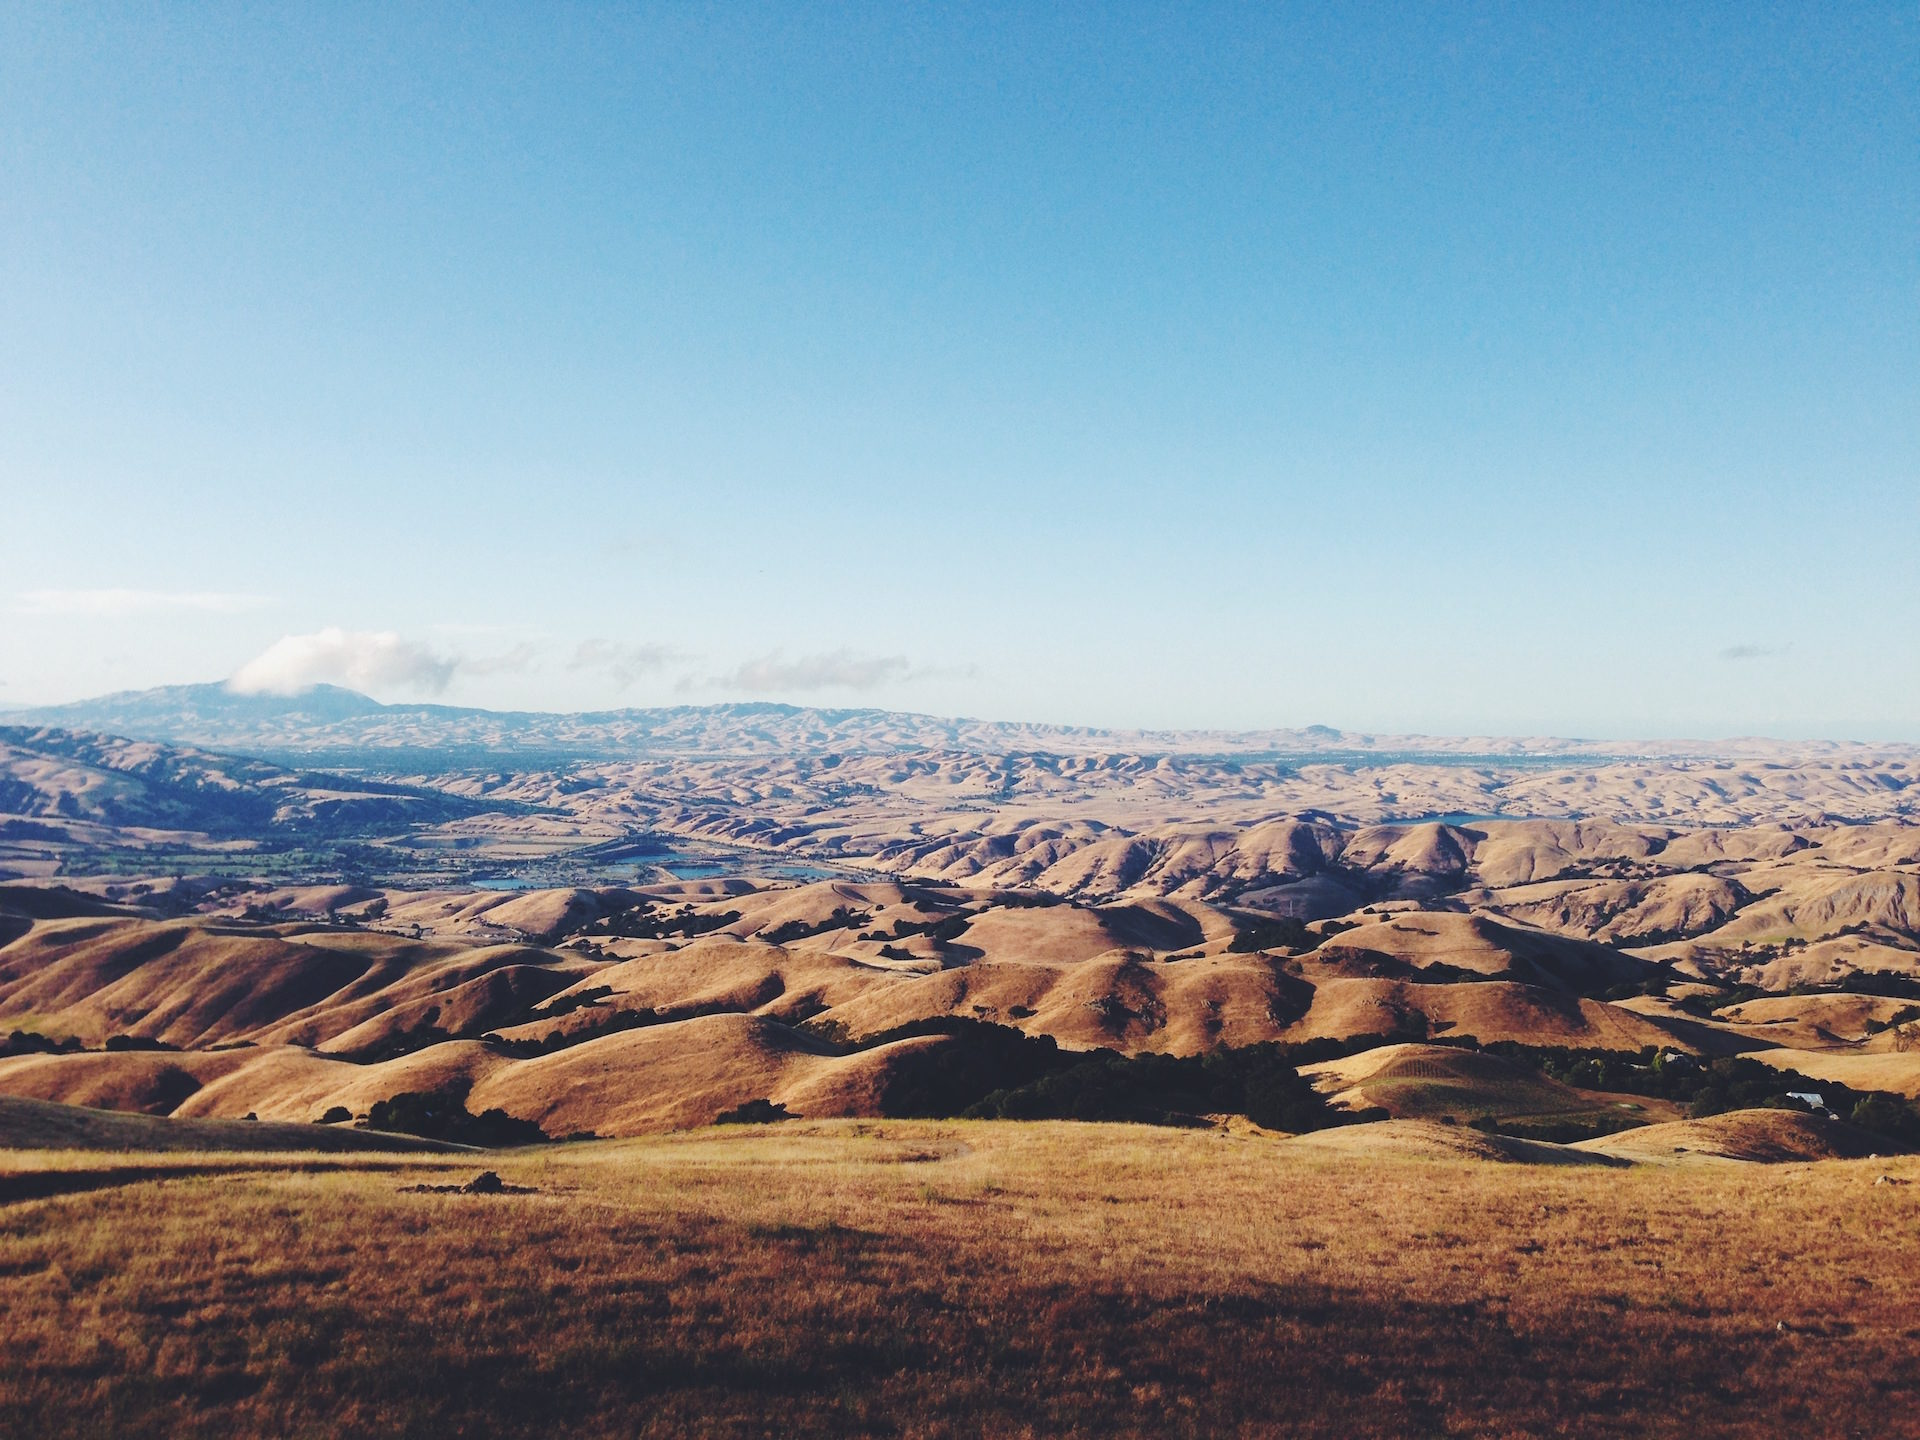 रेगिस्तान, Montañas, क्षितिज, आकाश, बादल - HD वॉलपेपर - प्रोफेसर-falken.com